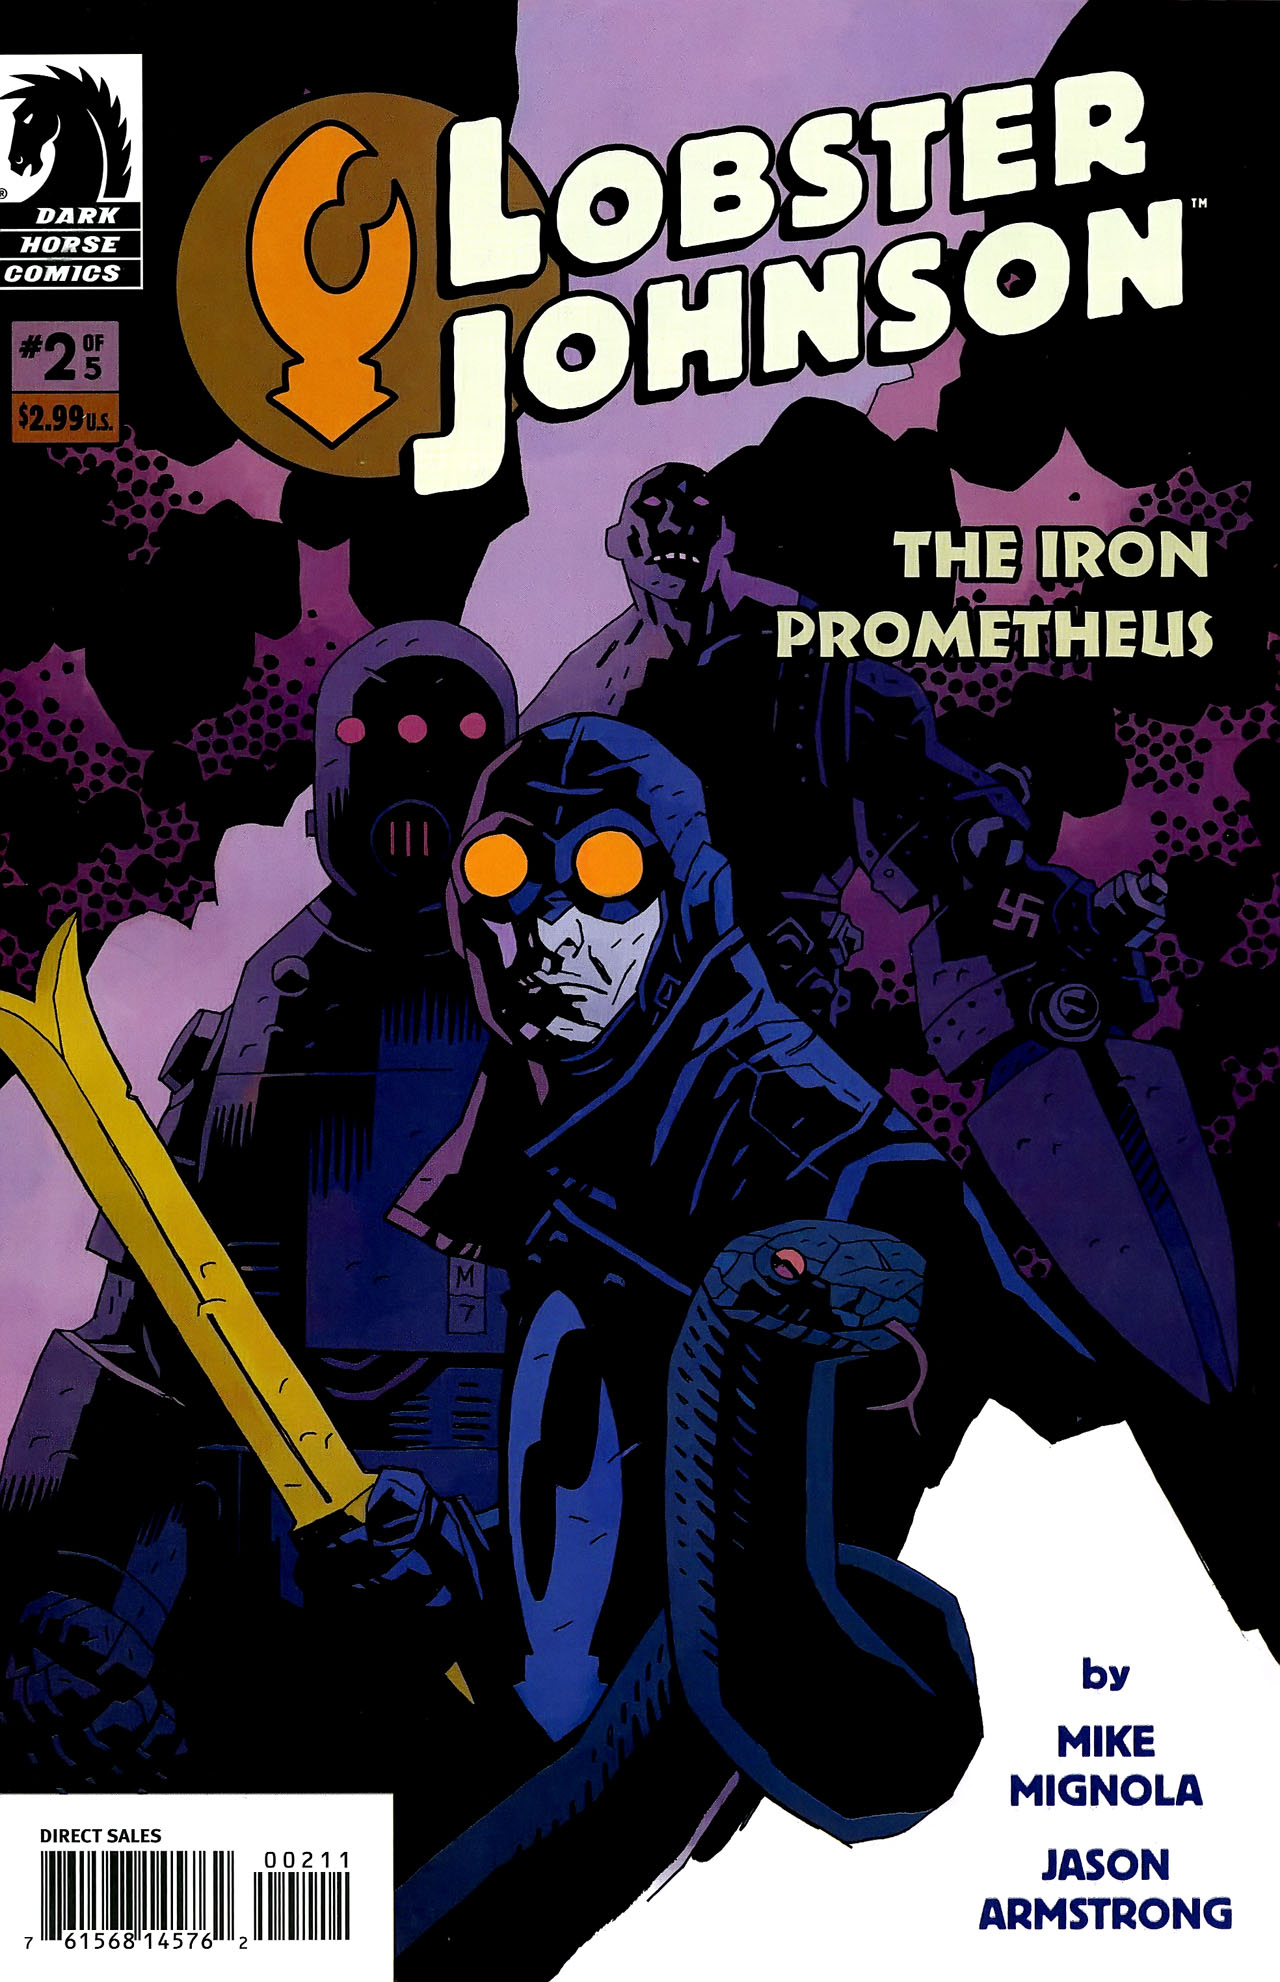 Read online Lobster Johnson: The Iron Prometheus comic -  Issue #2 - 1